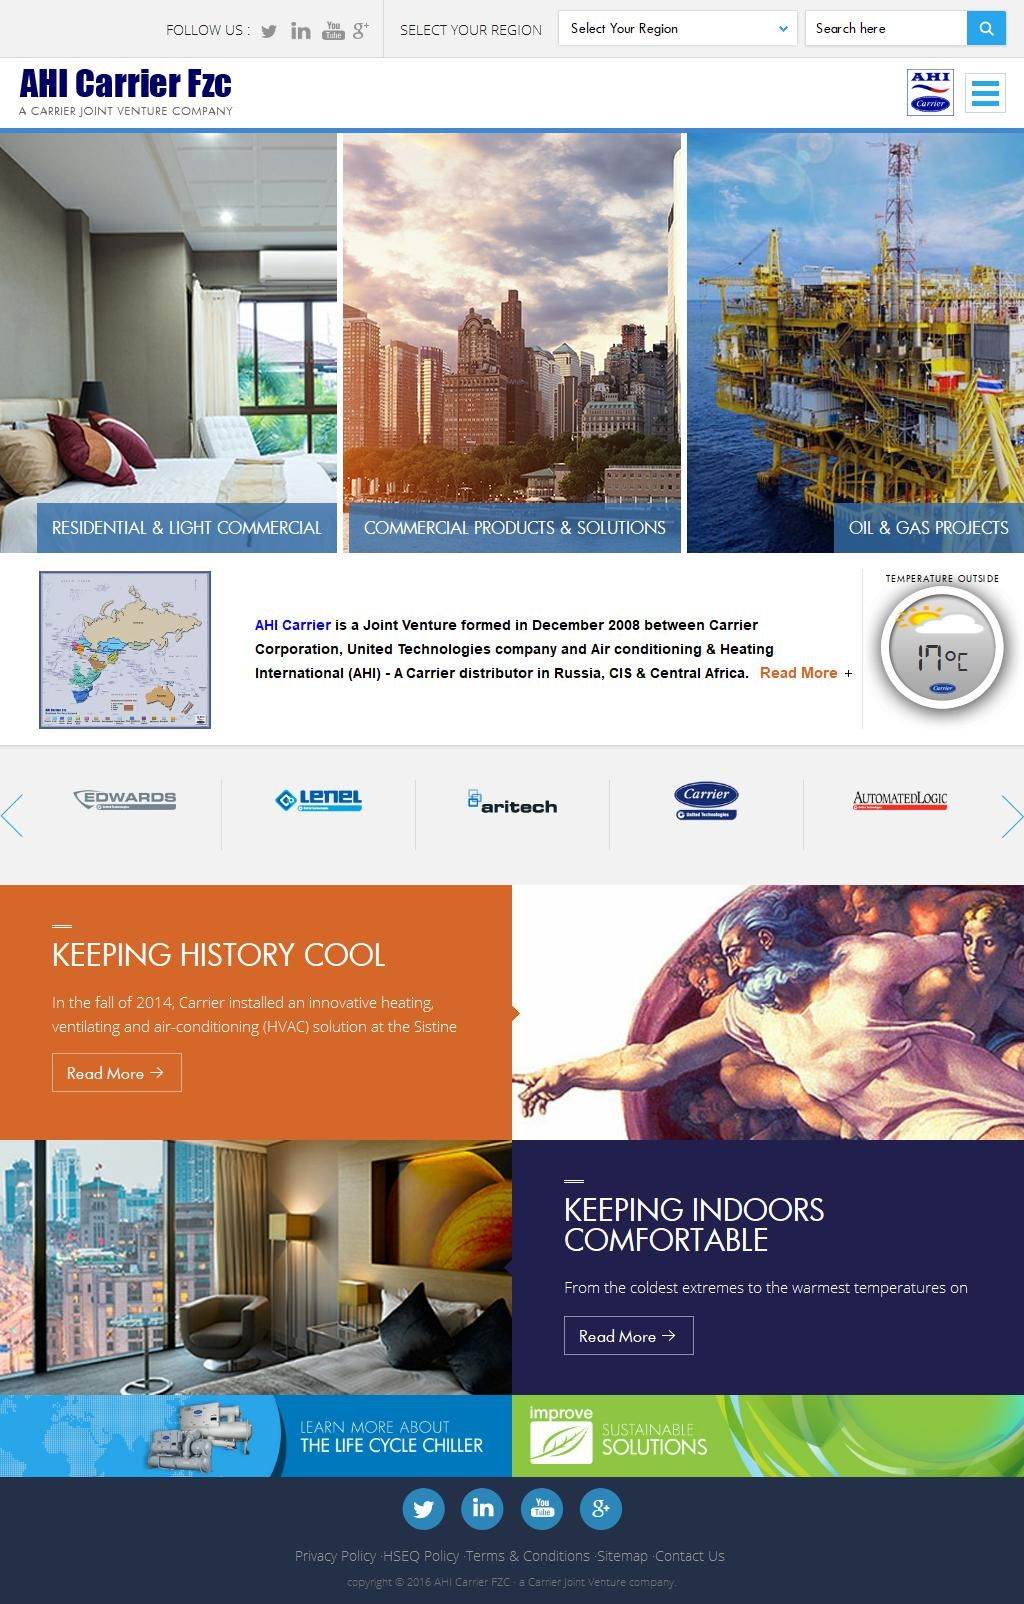 Airconditioning & Heating International Fze Air